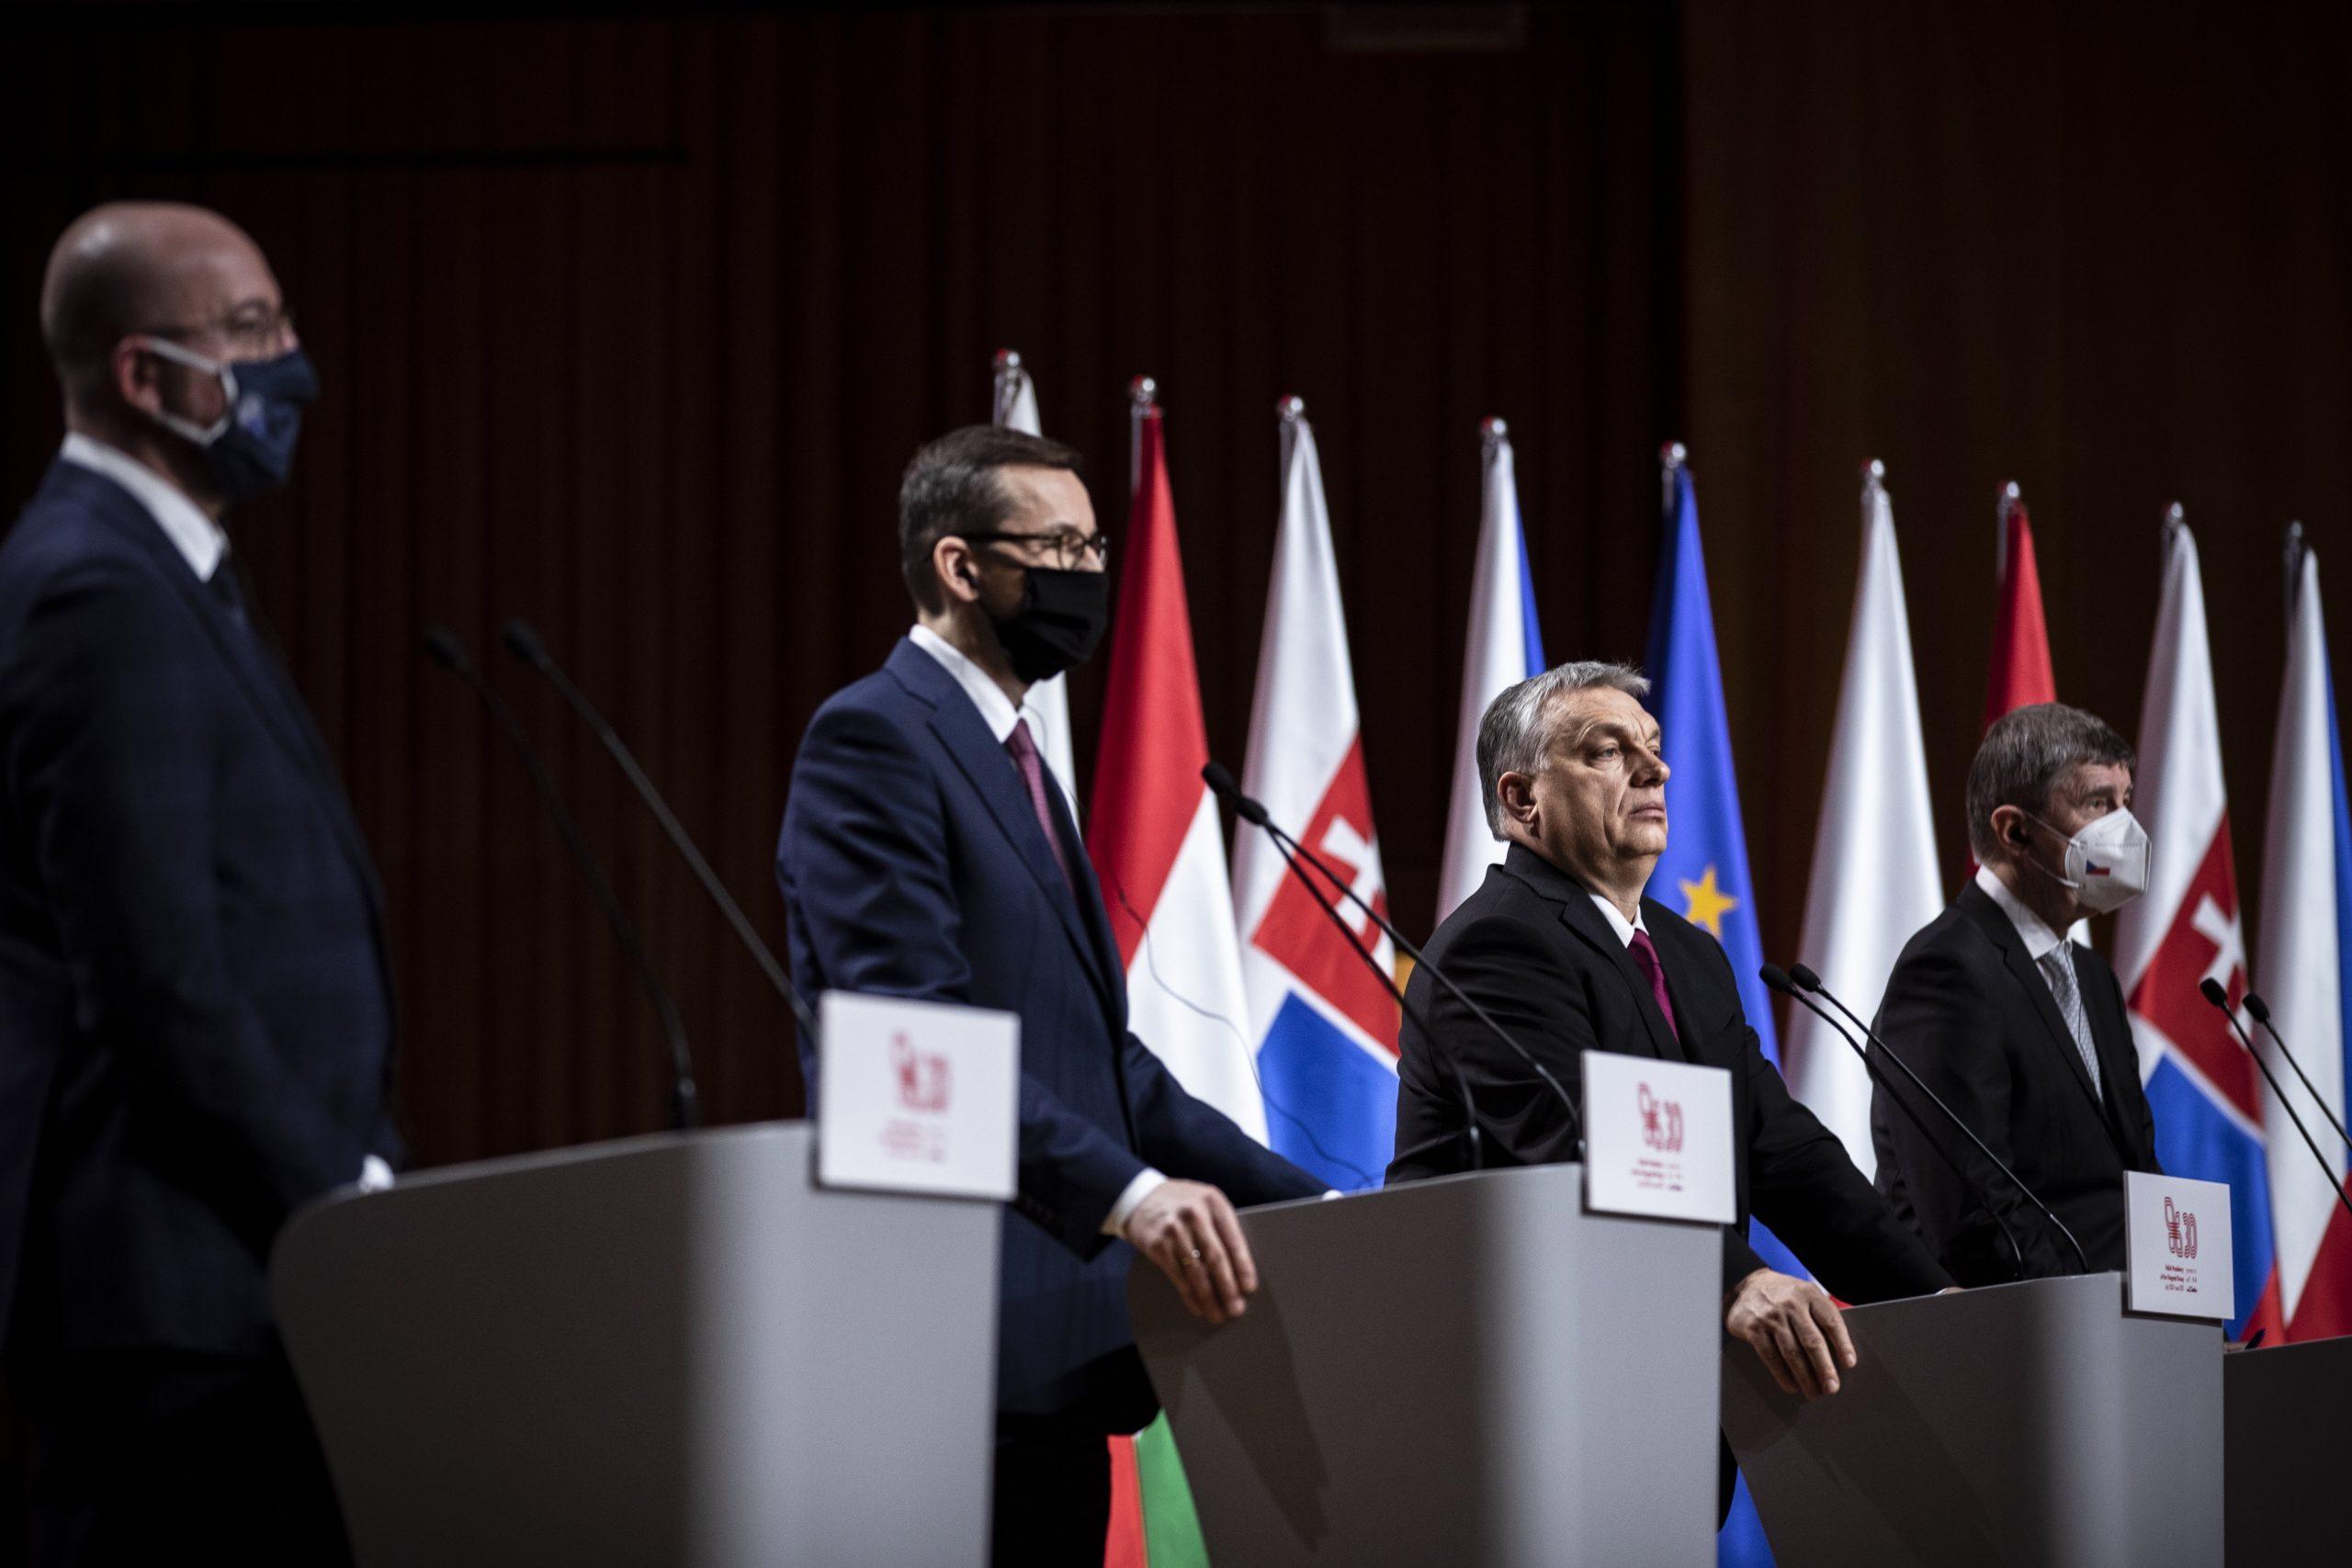 PM Orbán: Unity Key to V4's Success